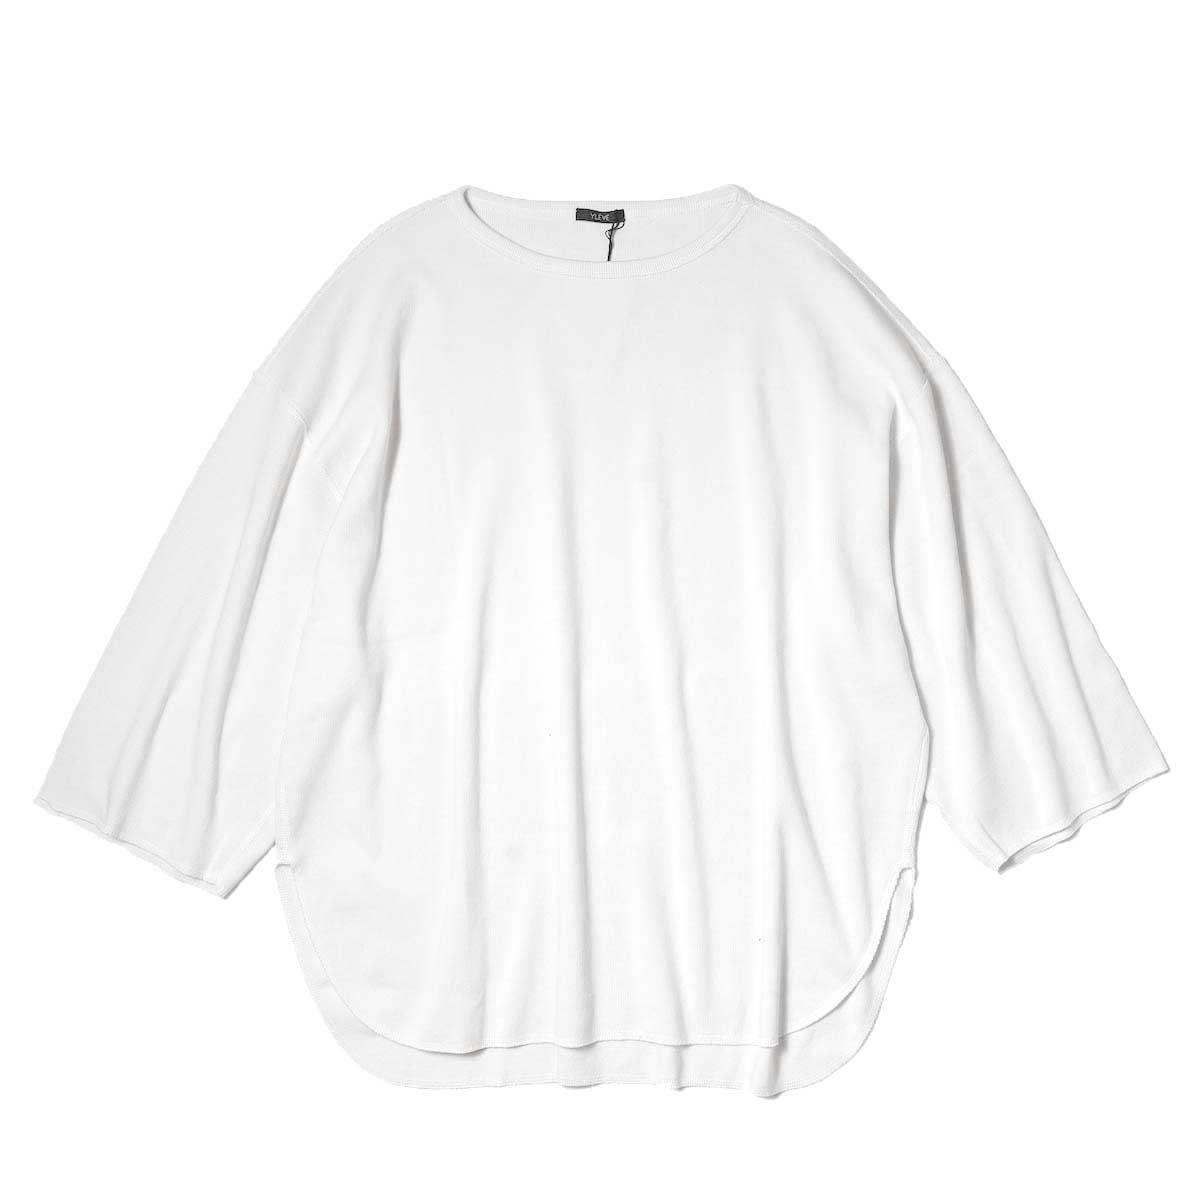 YLEVE / CTN RIB P/O BIG (White)